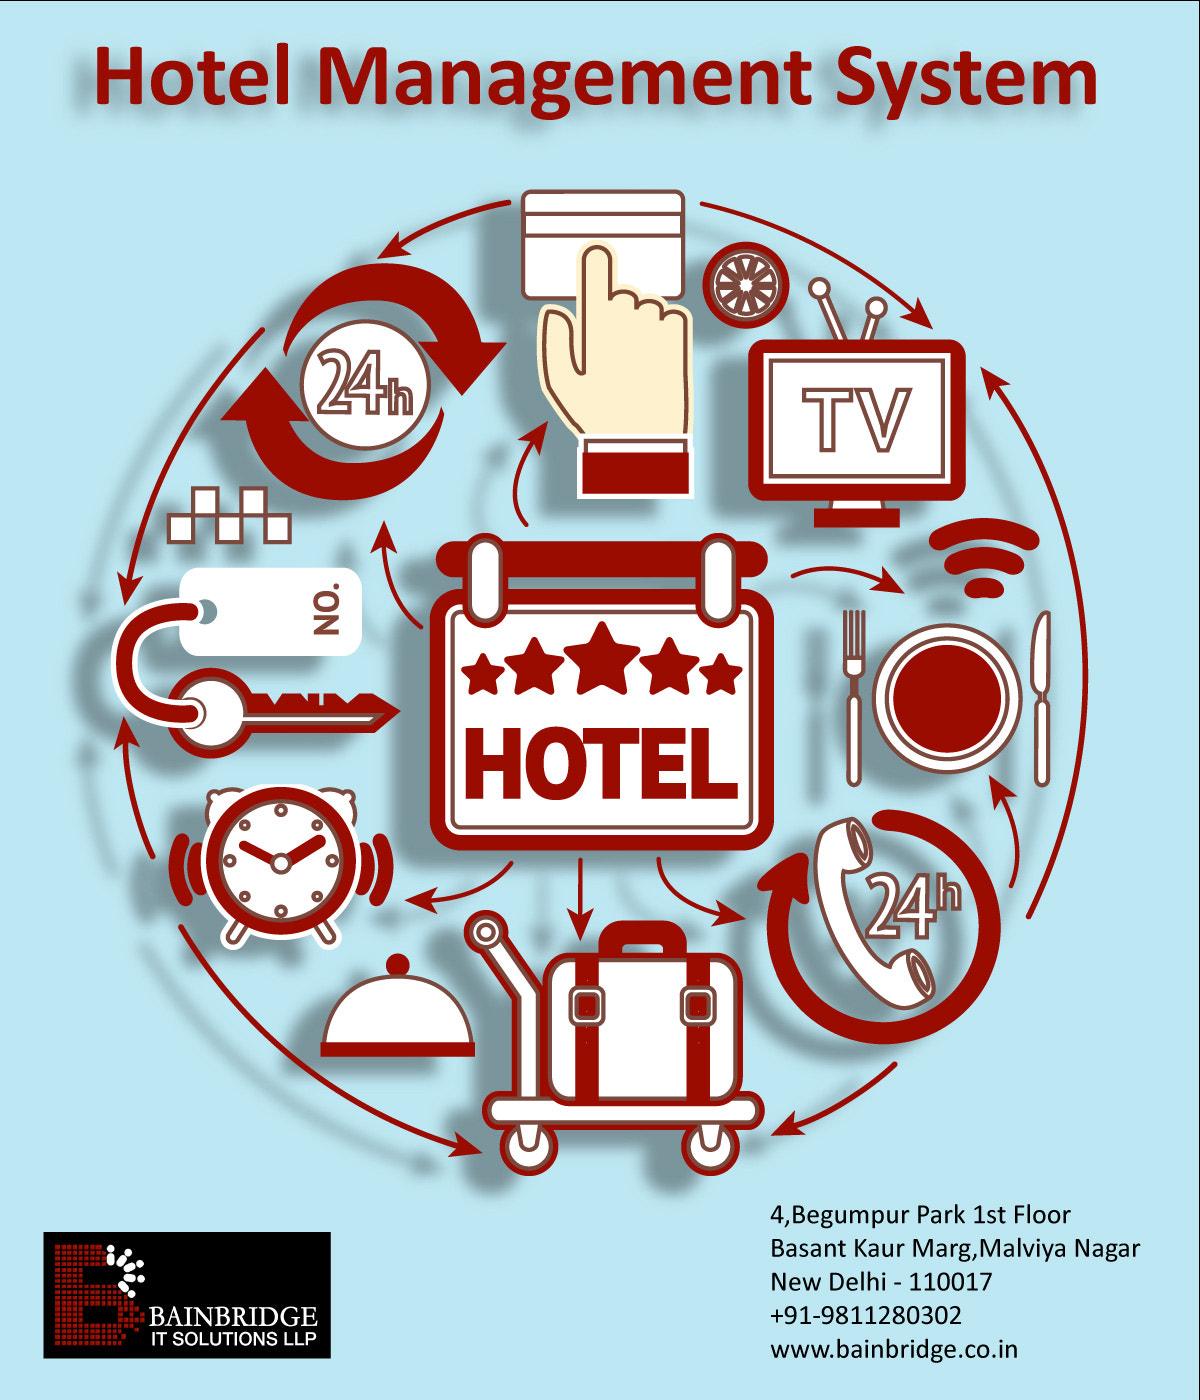 BainBridge Hotel Management